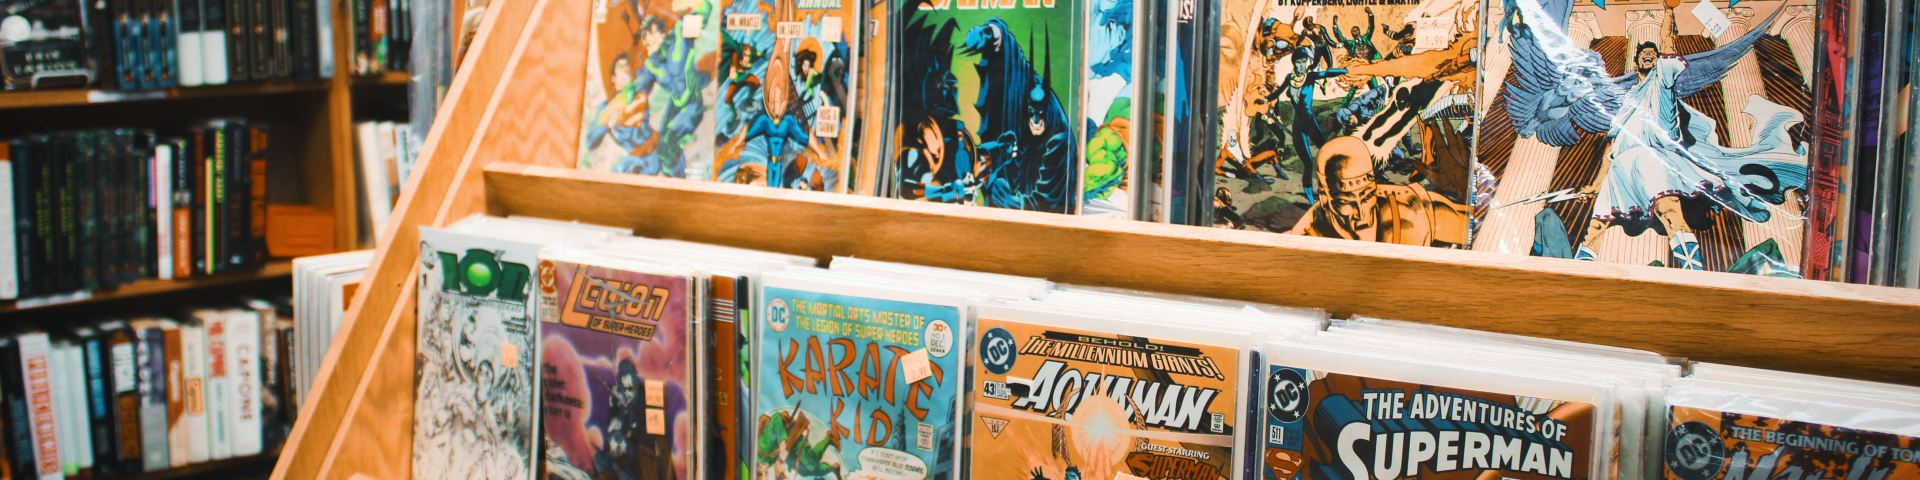 Comics featured image